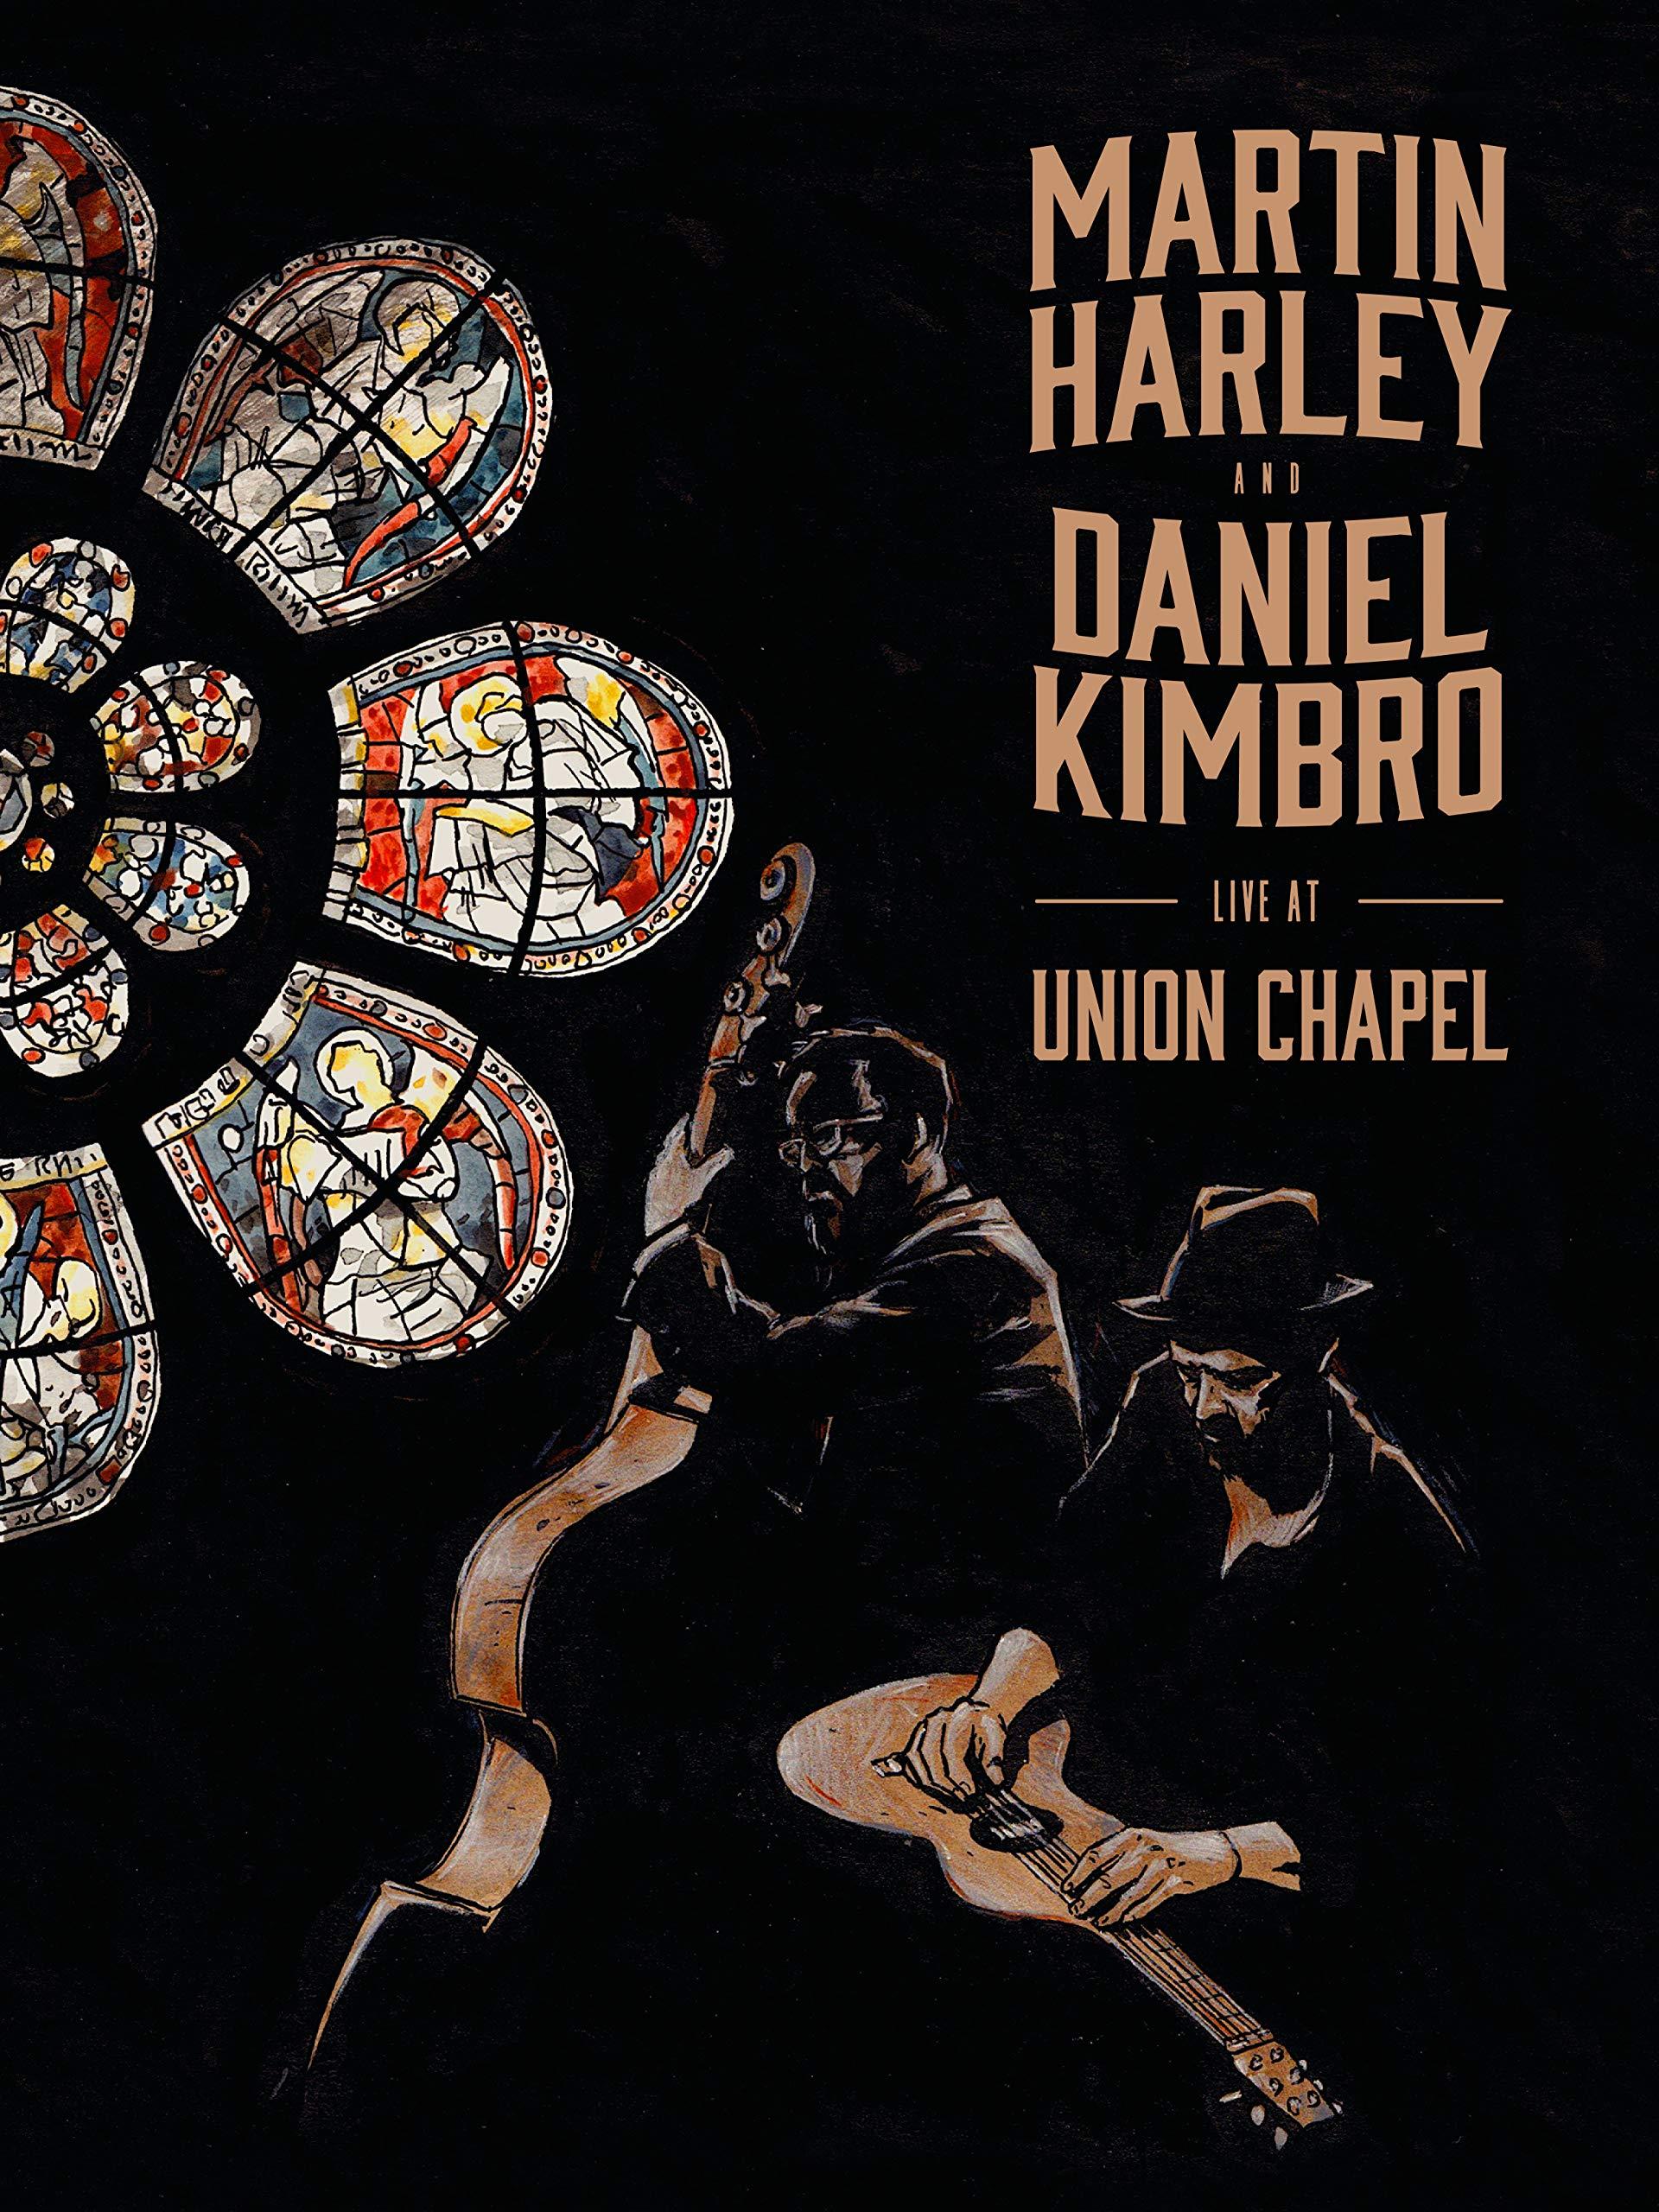 Martin Harley & Daniel Kimbro - Live at the Union Chapel on Amazon Prime Video UK